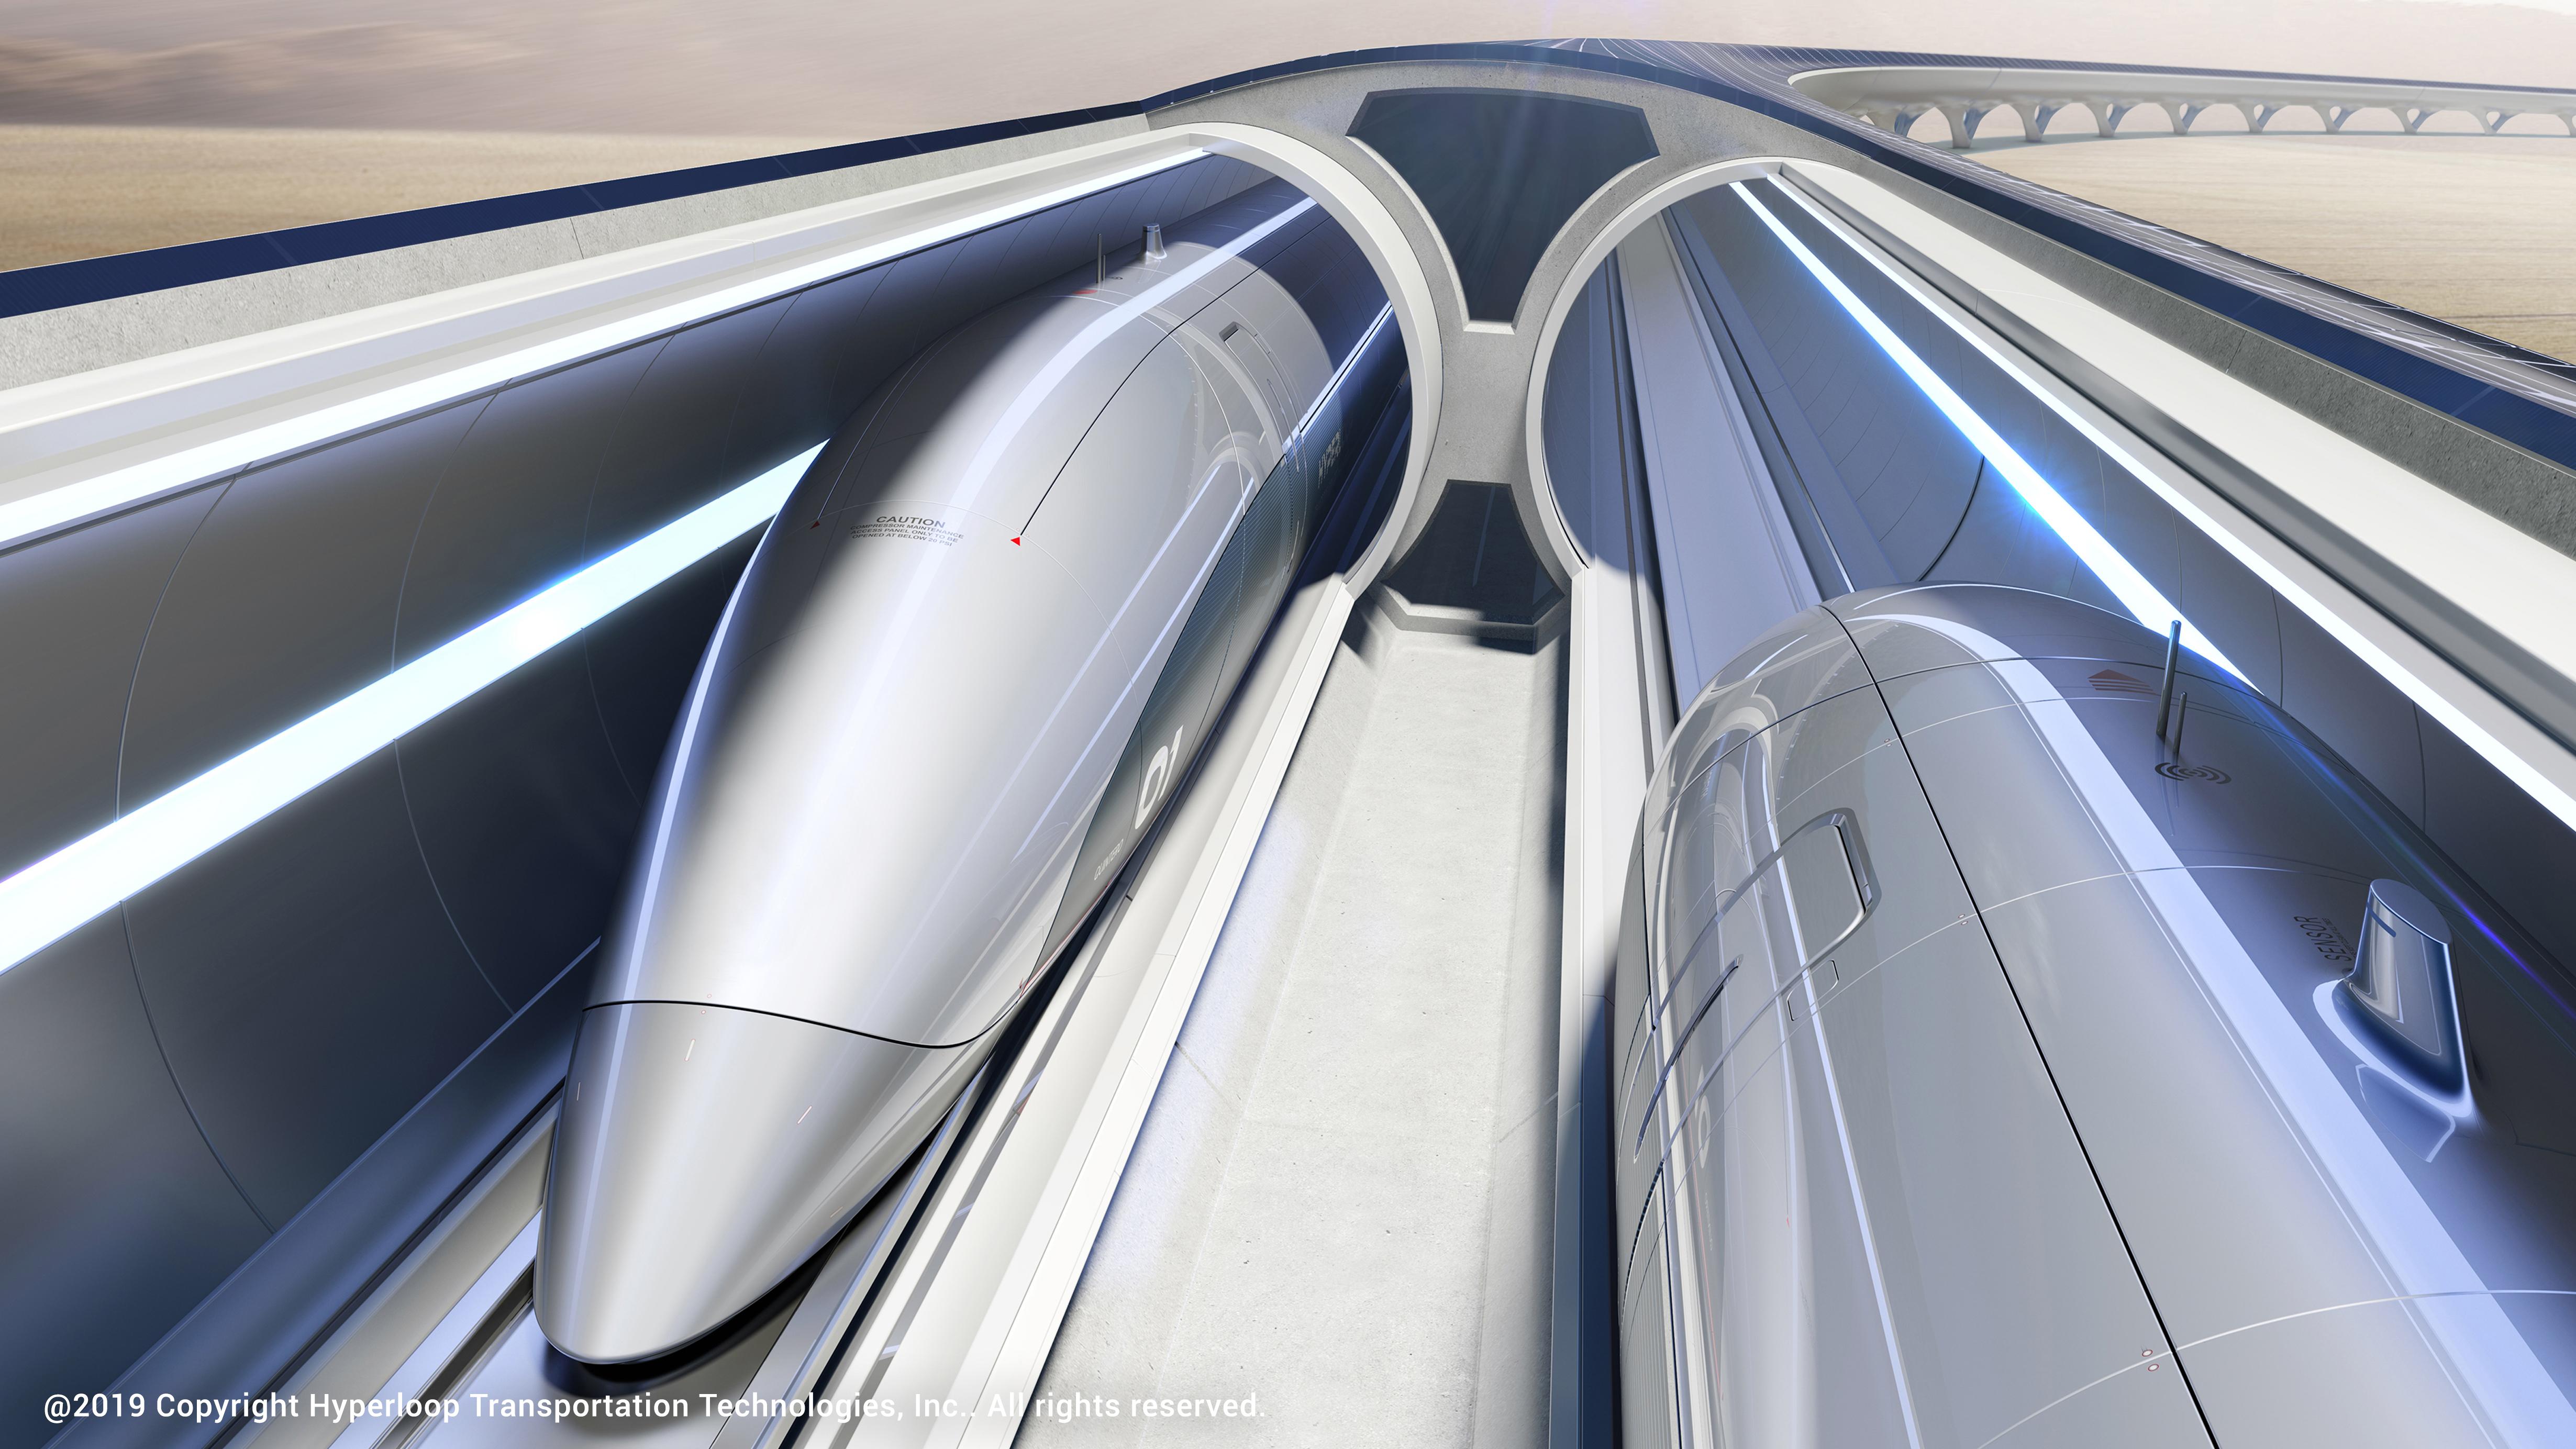 Zaha Hadid Architects has joined with Hyperloop Italia to bring the burgeoning transportation technology to Italy